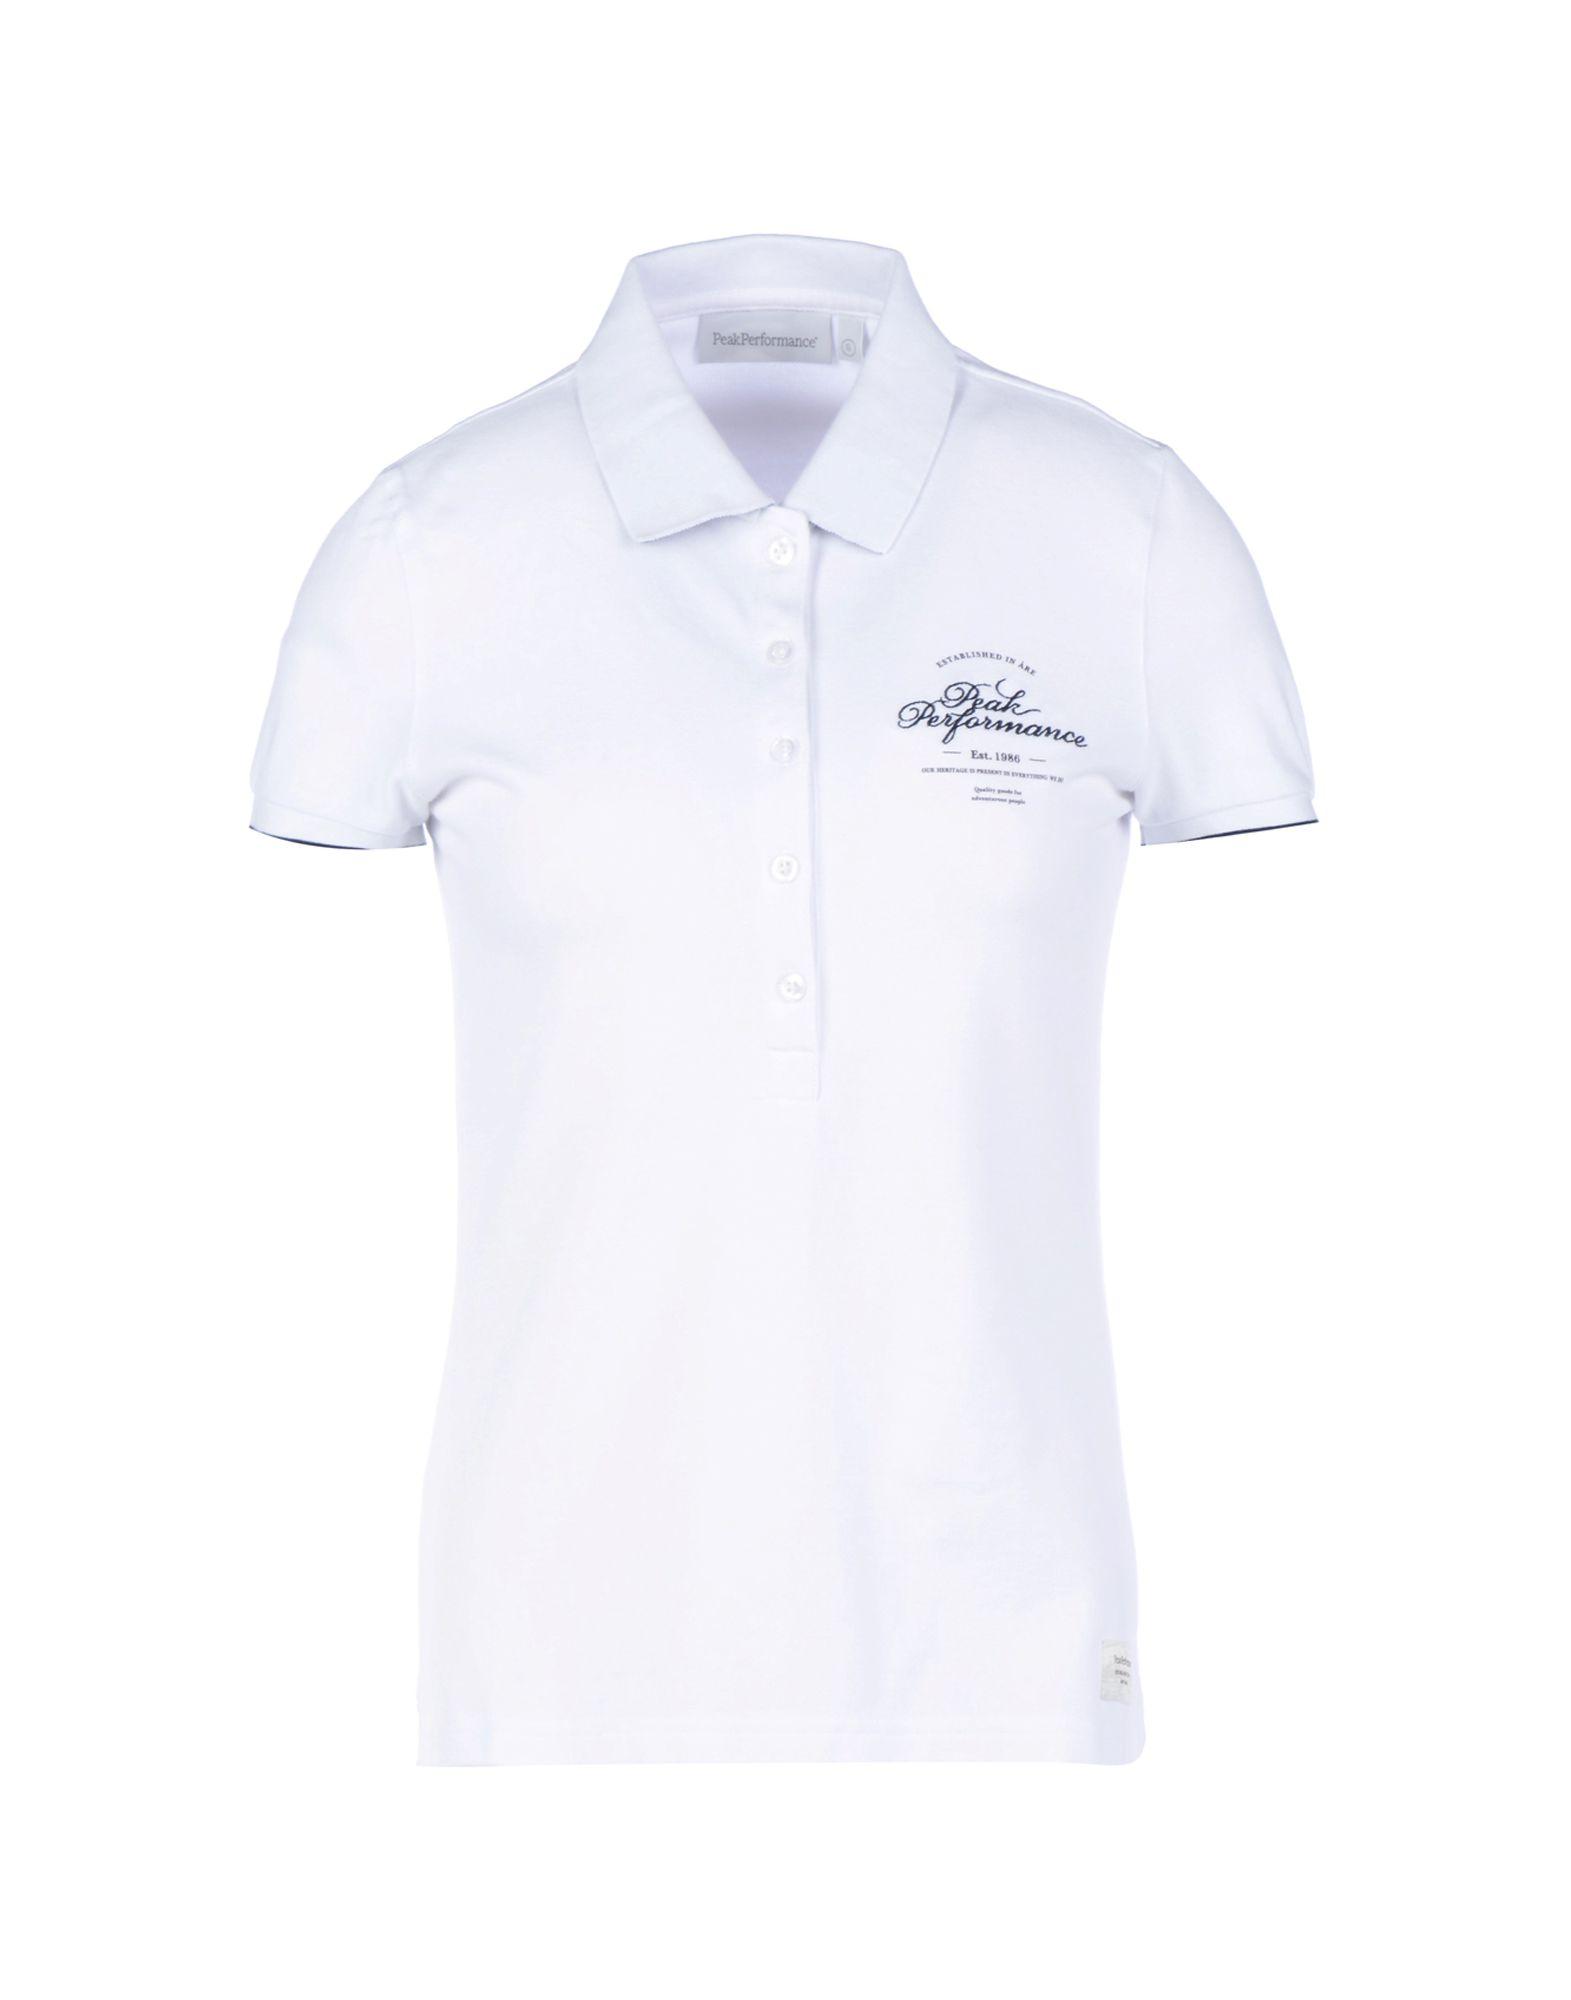 PEAK PERFORMANCE Поло peak performance футболка поло peak performance gpan модель 2710424